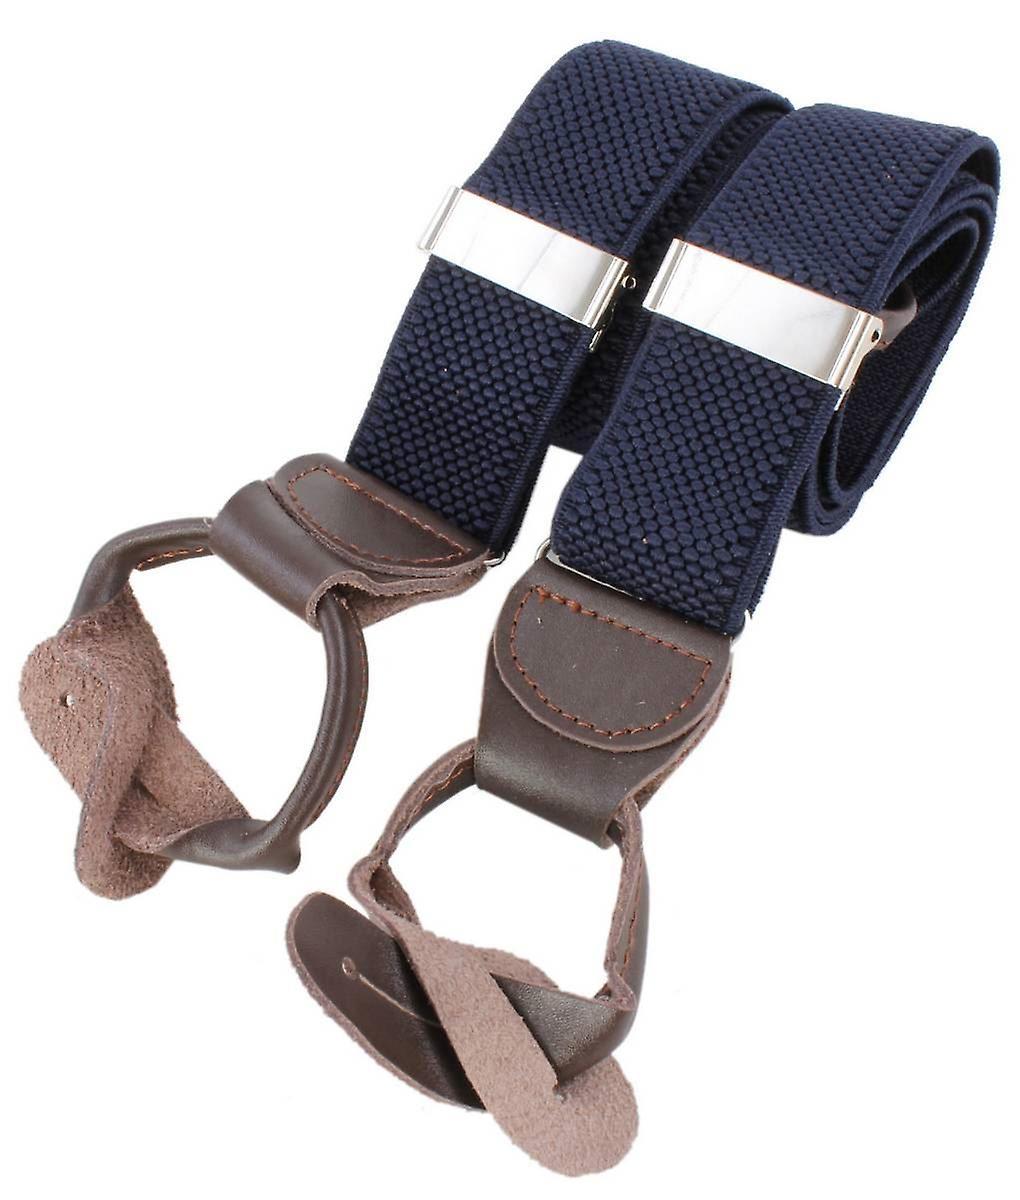 Knightsbridge cravates Luxury Braces - Navy